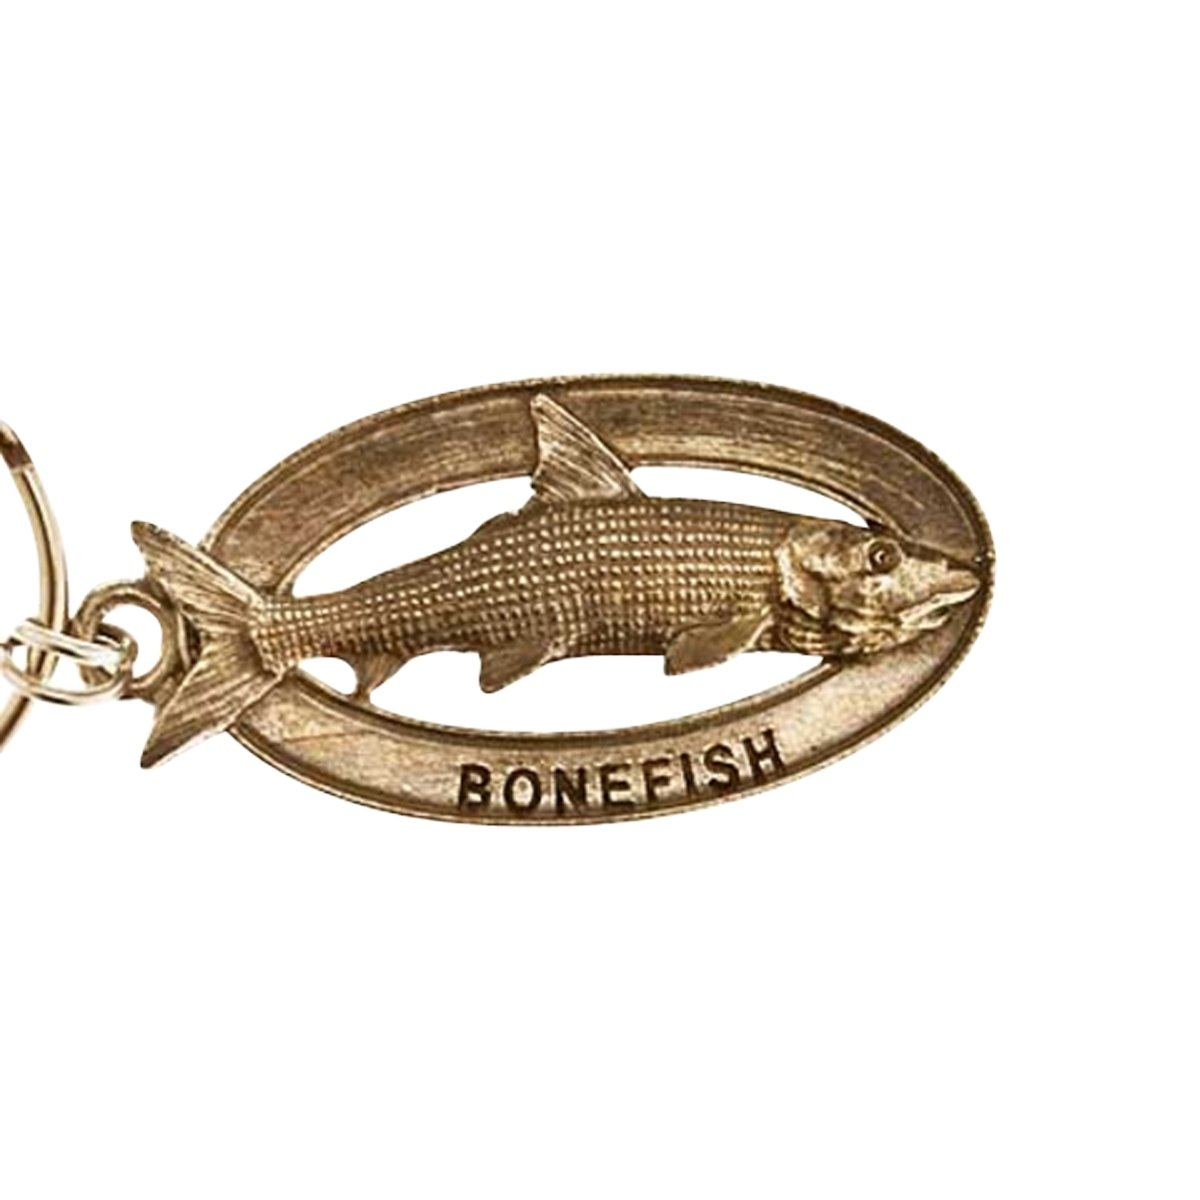 Creative Pewter Designs, Pewter Bonefish Key Chain, Antiqued Finish, SK037